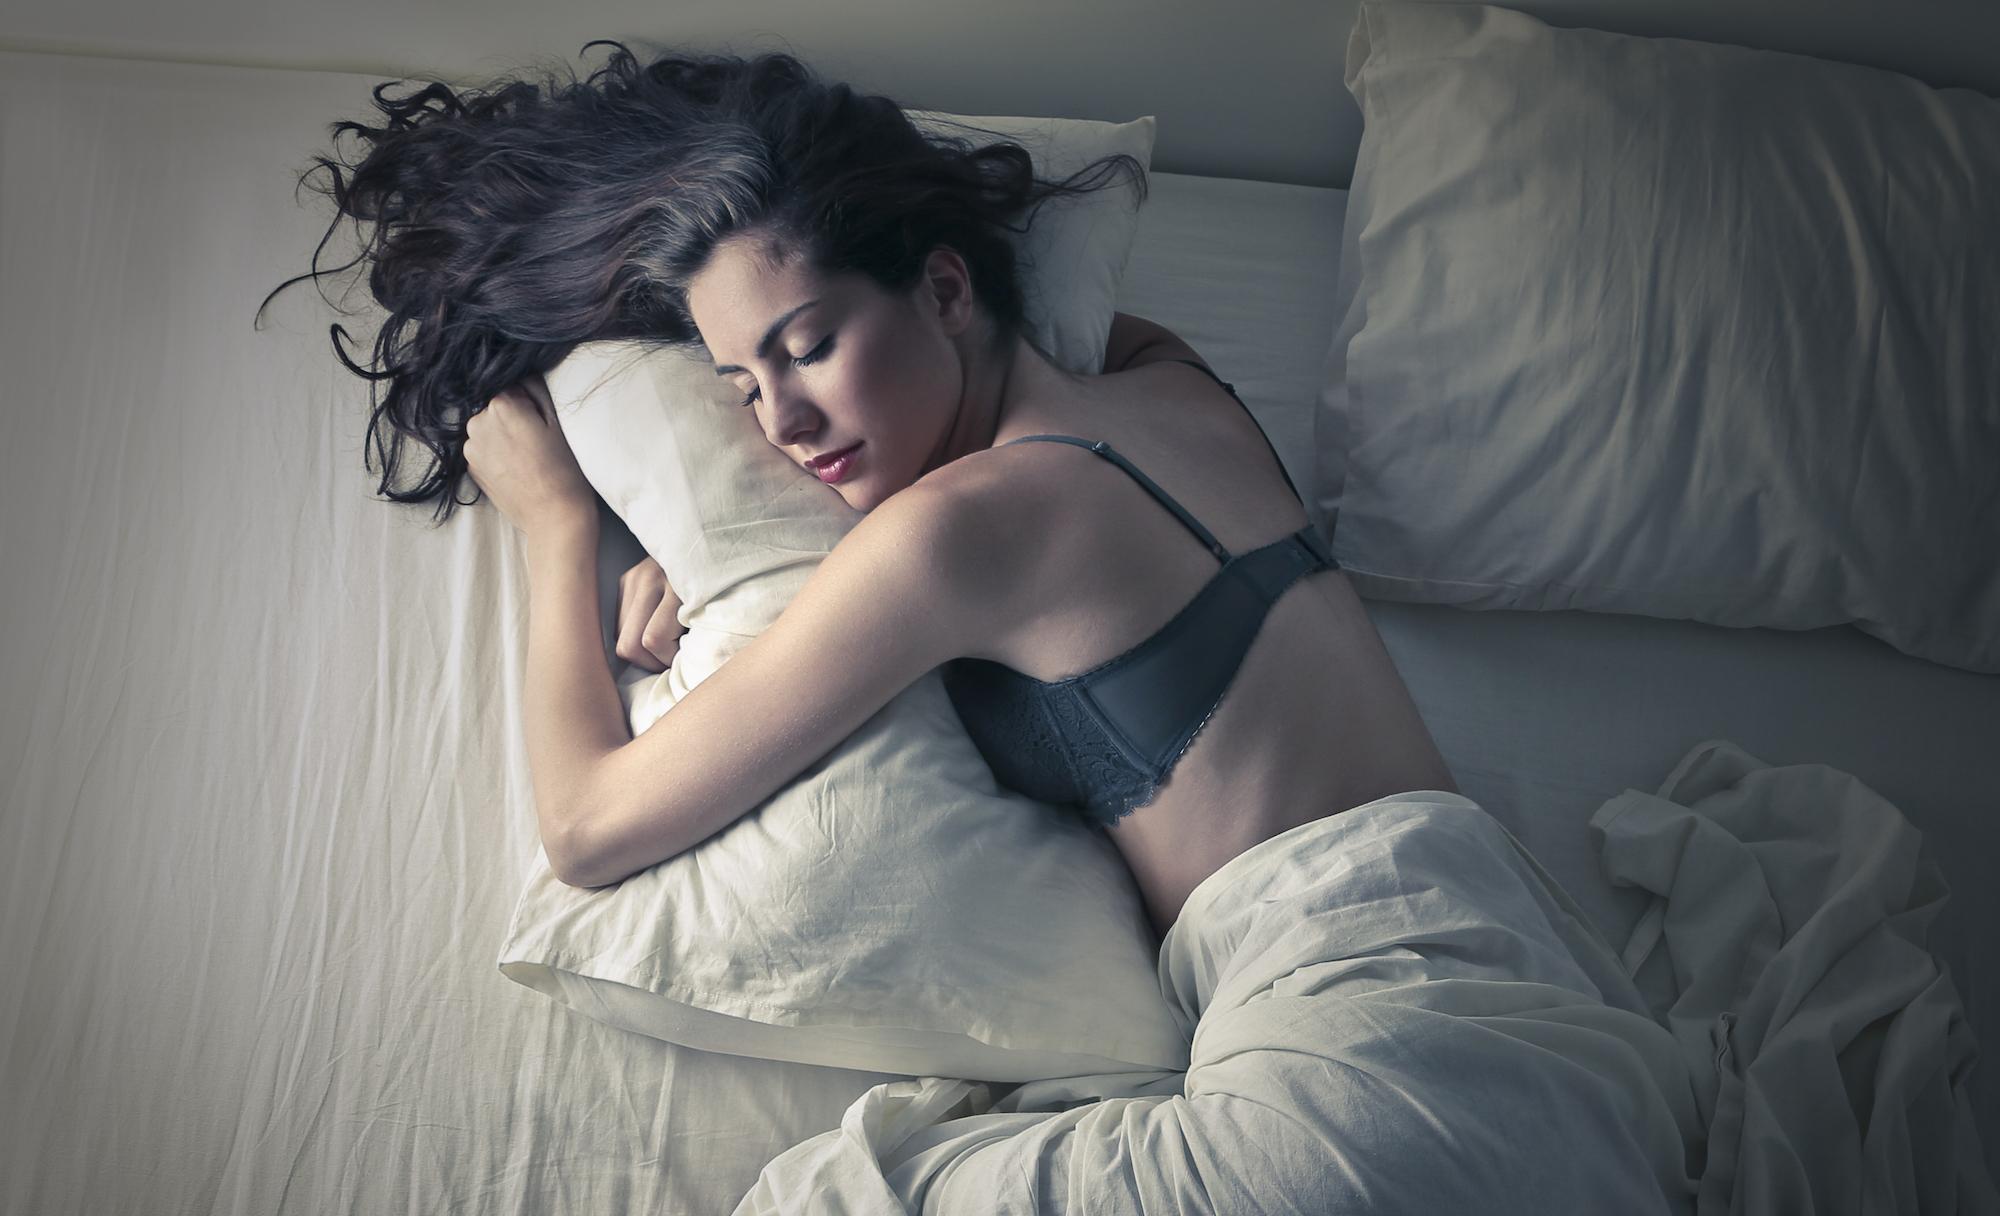 young-woman-sleeping-PVKBCPB